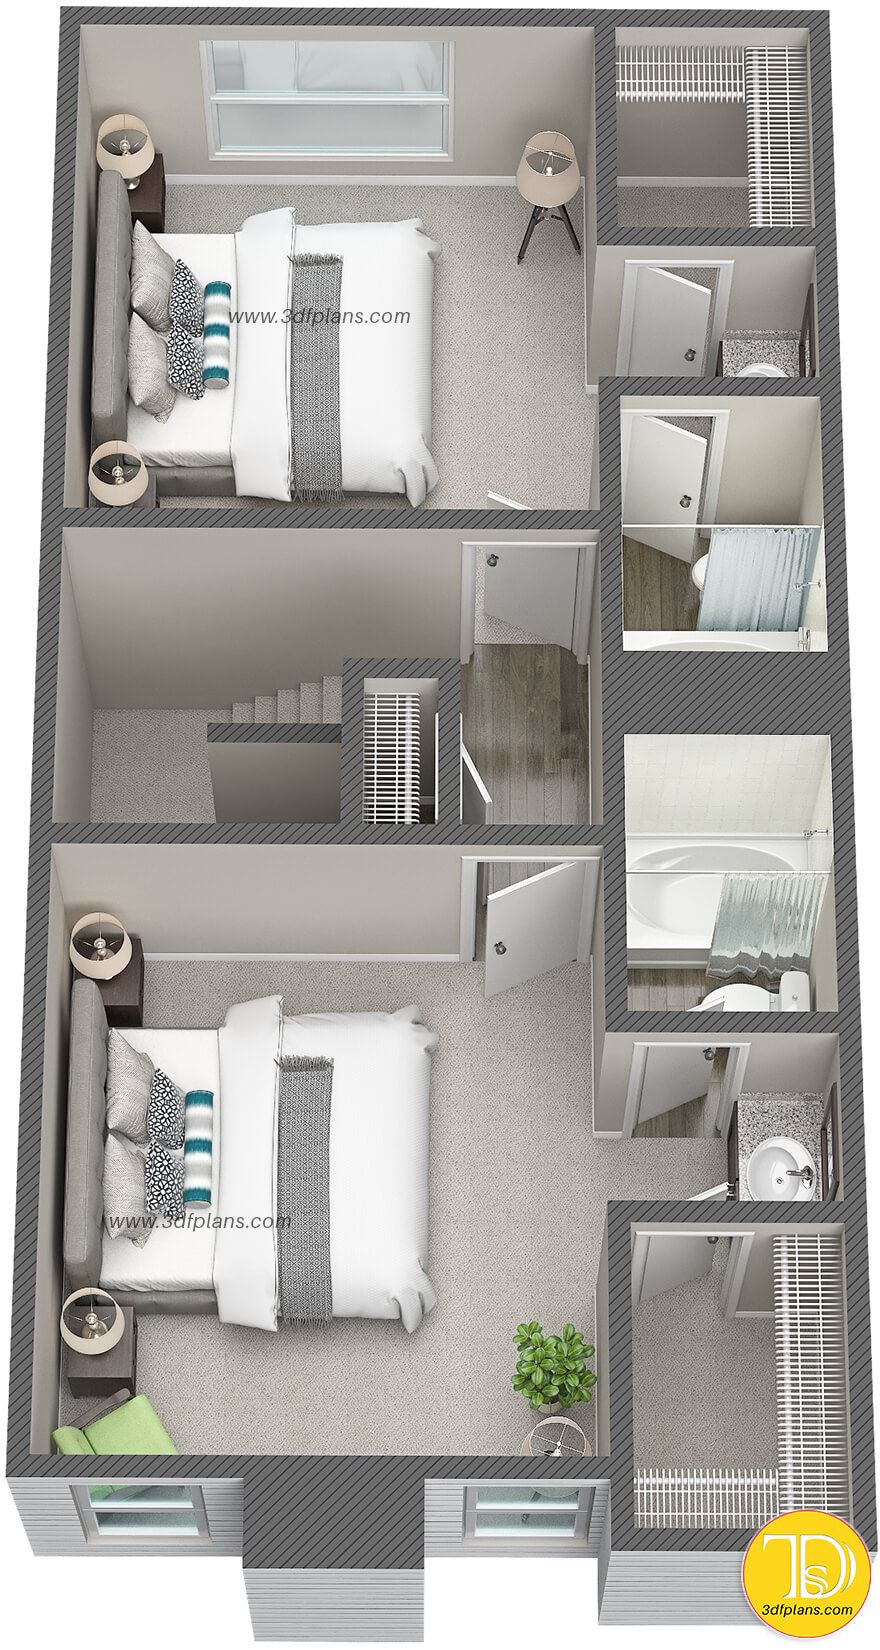 3d Floor Plans For Apartment Community In Houston Tx In 2020 Condo Floor Plans Home Design Floor Plans House Layout Plans